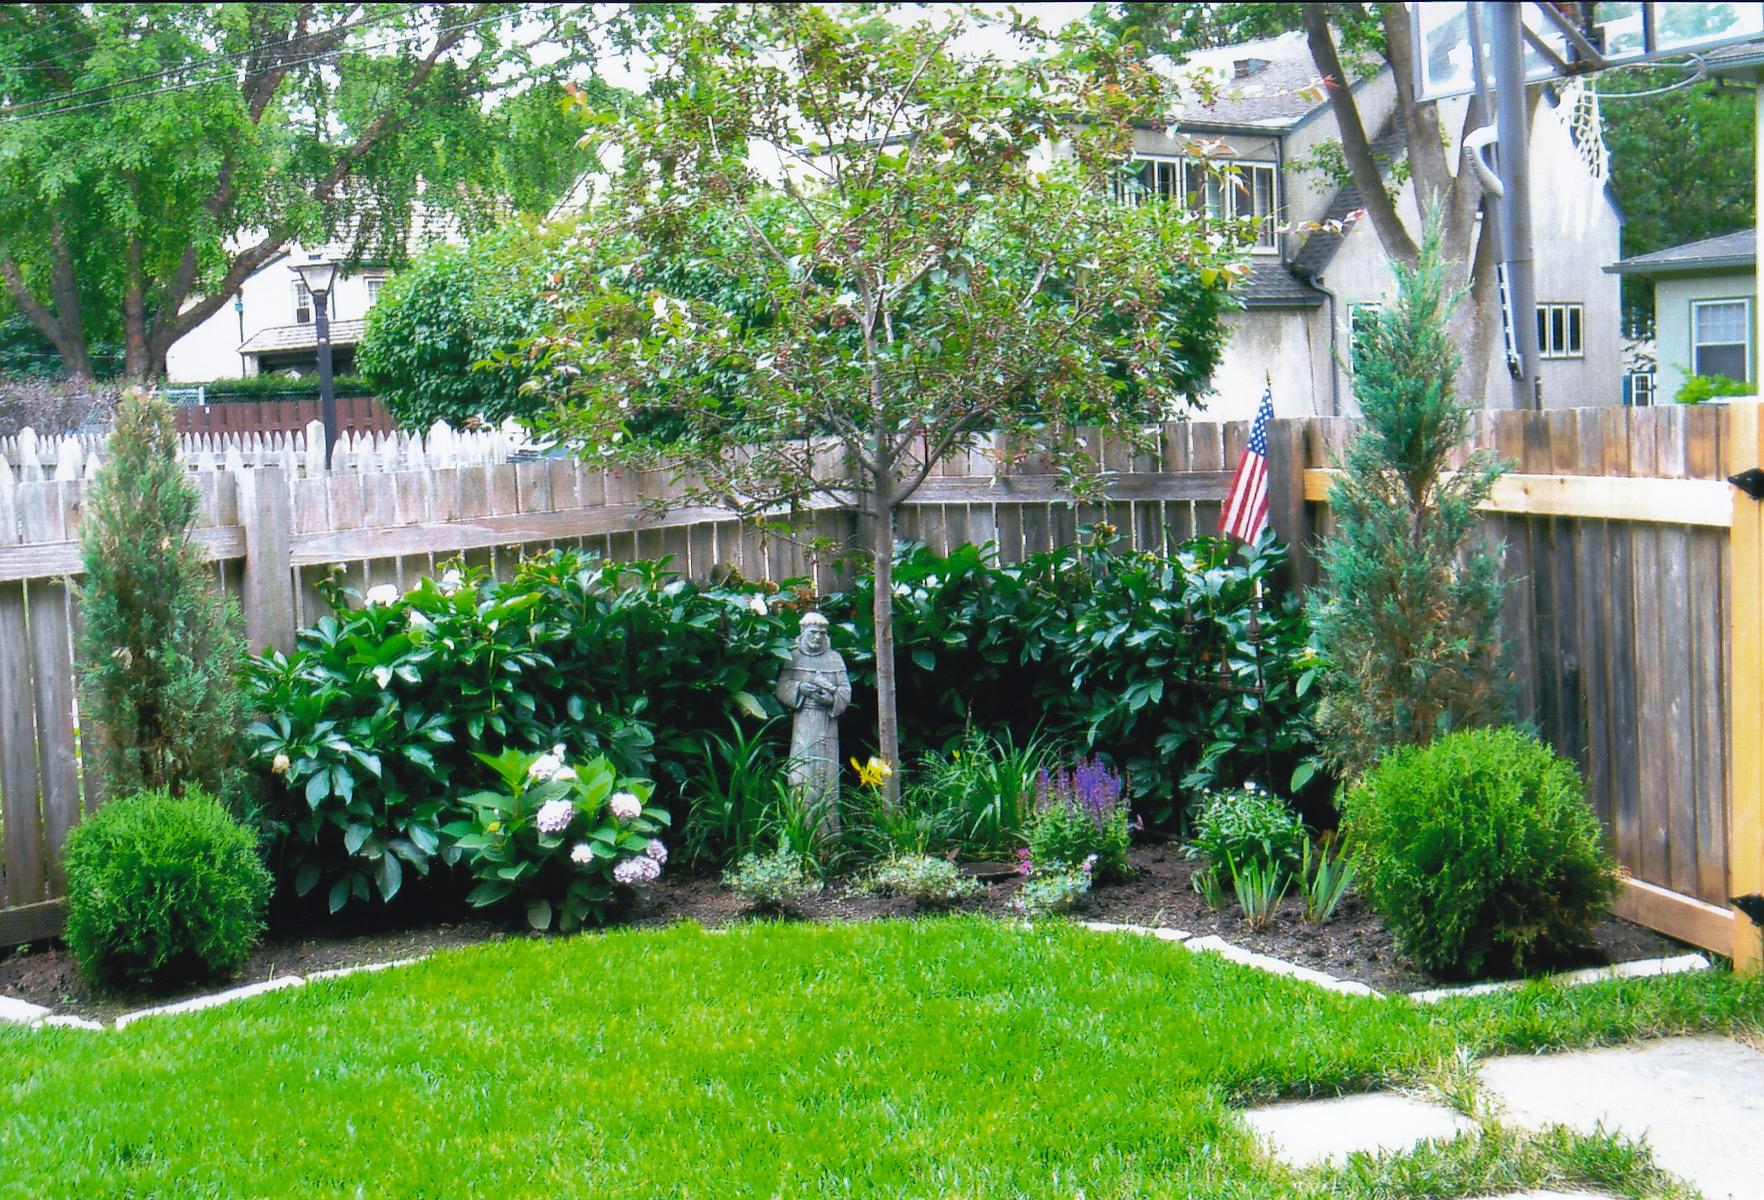 About | Margie's Gardens